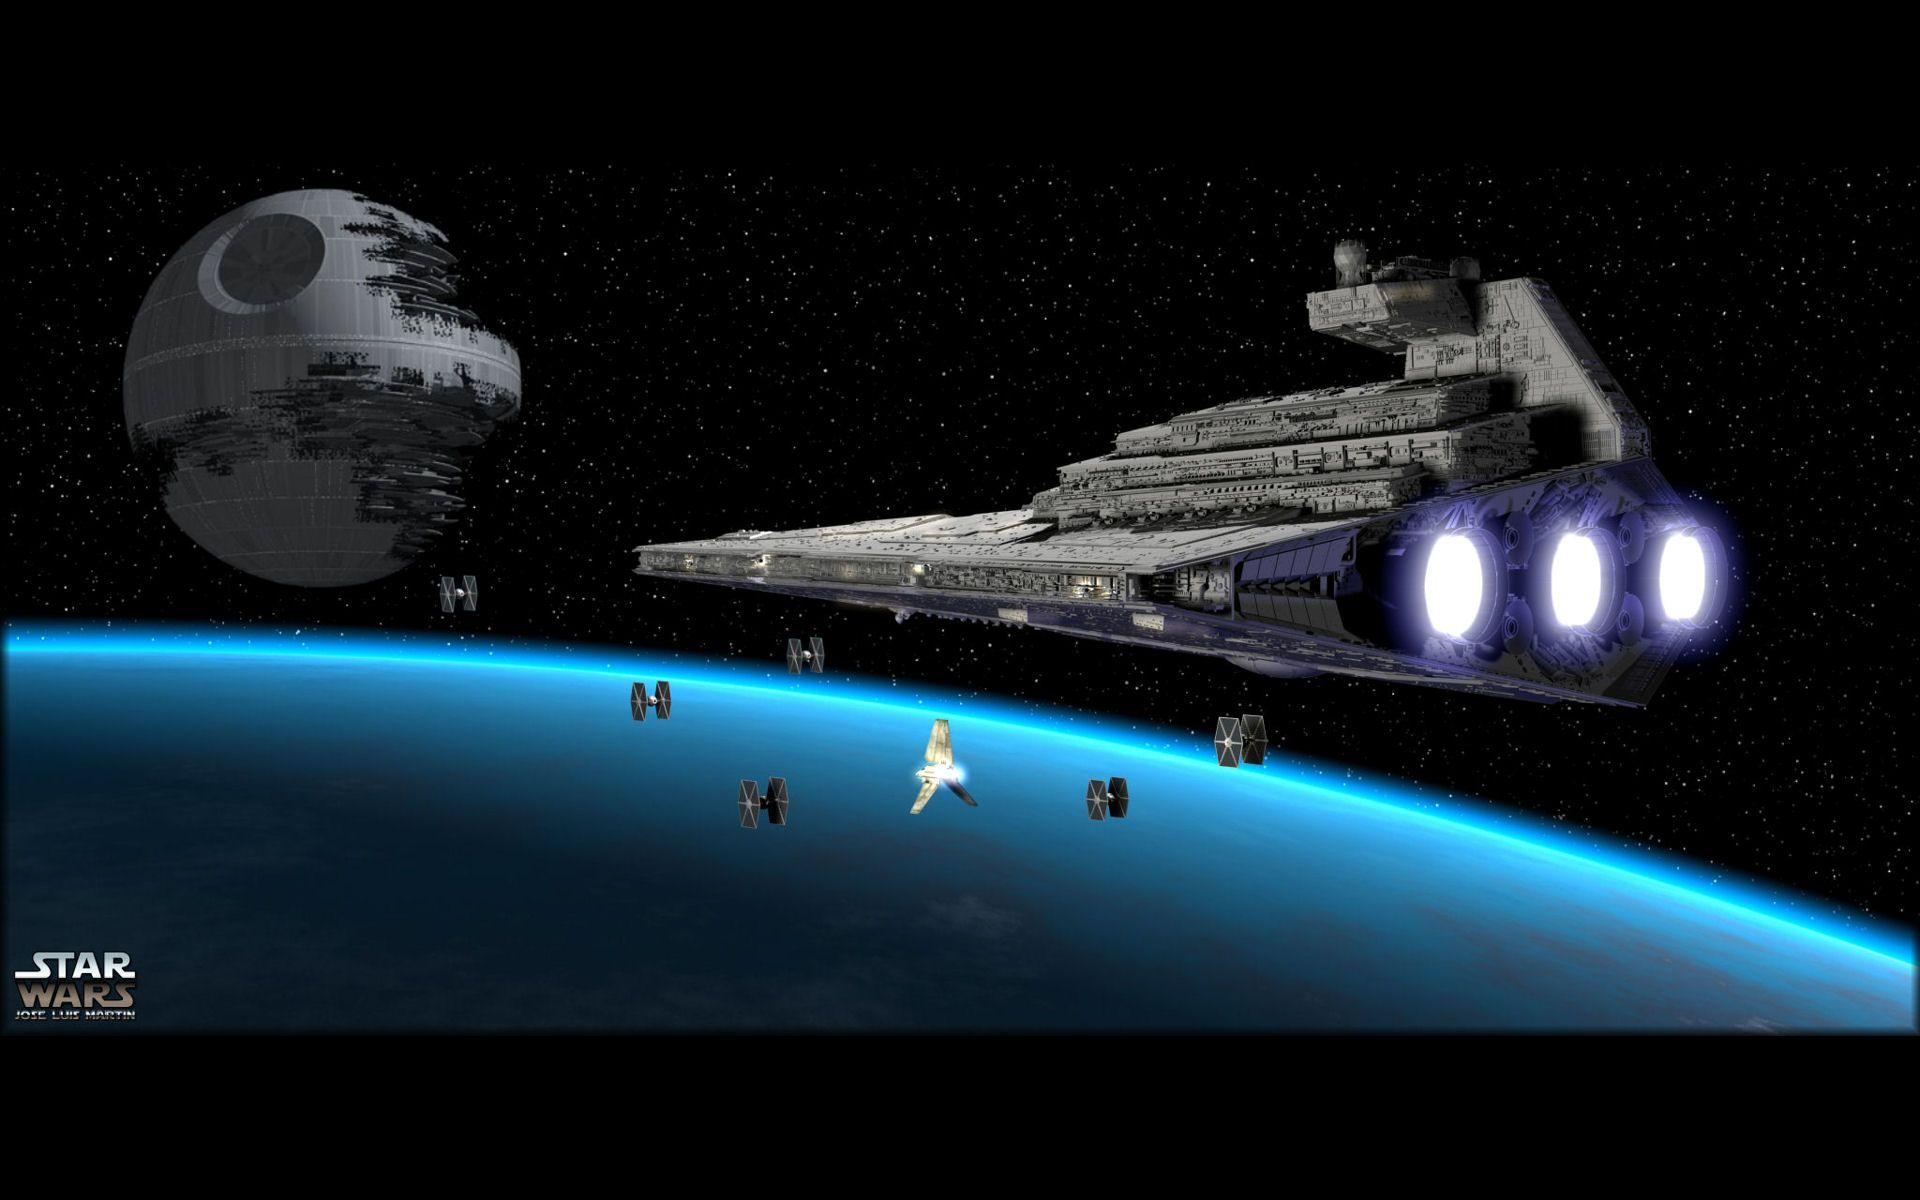 Star Wars Desktop Wallpapers Wallpaper Cave